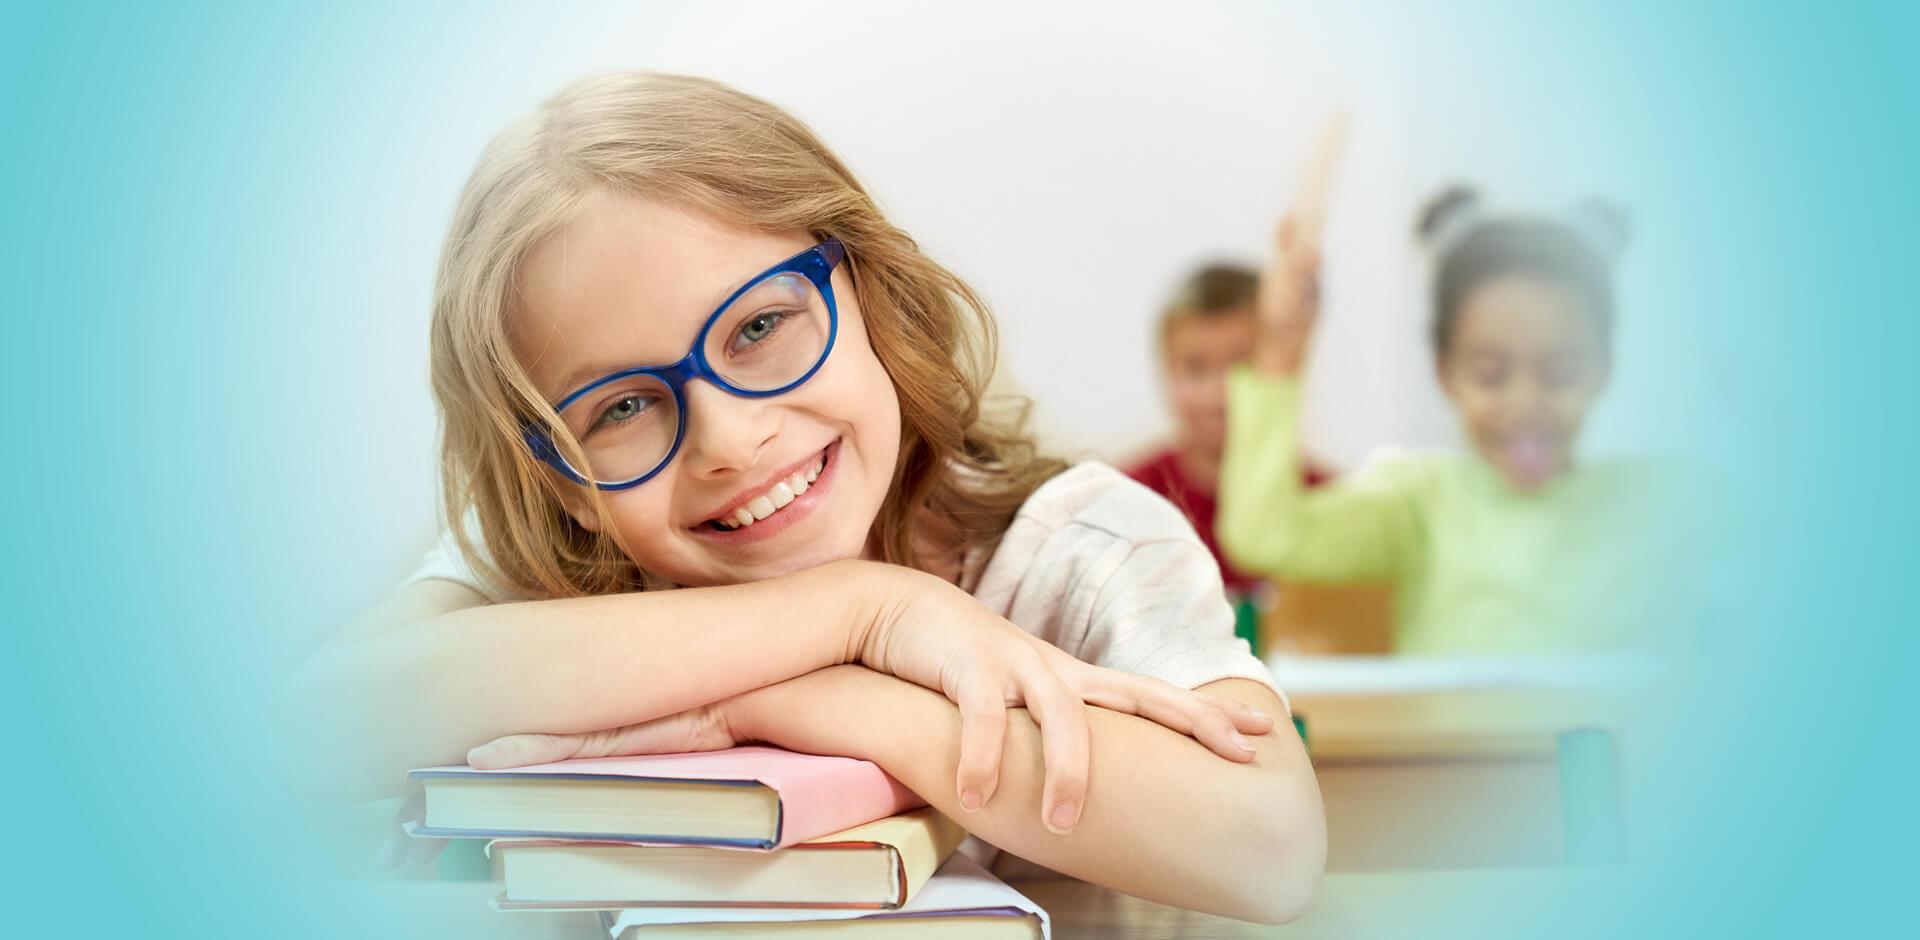 eye doctor, girl with glasses